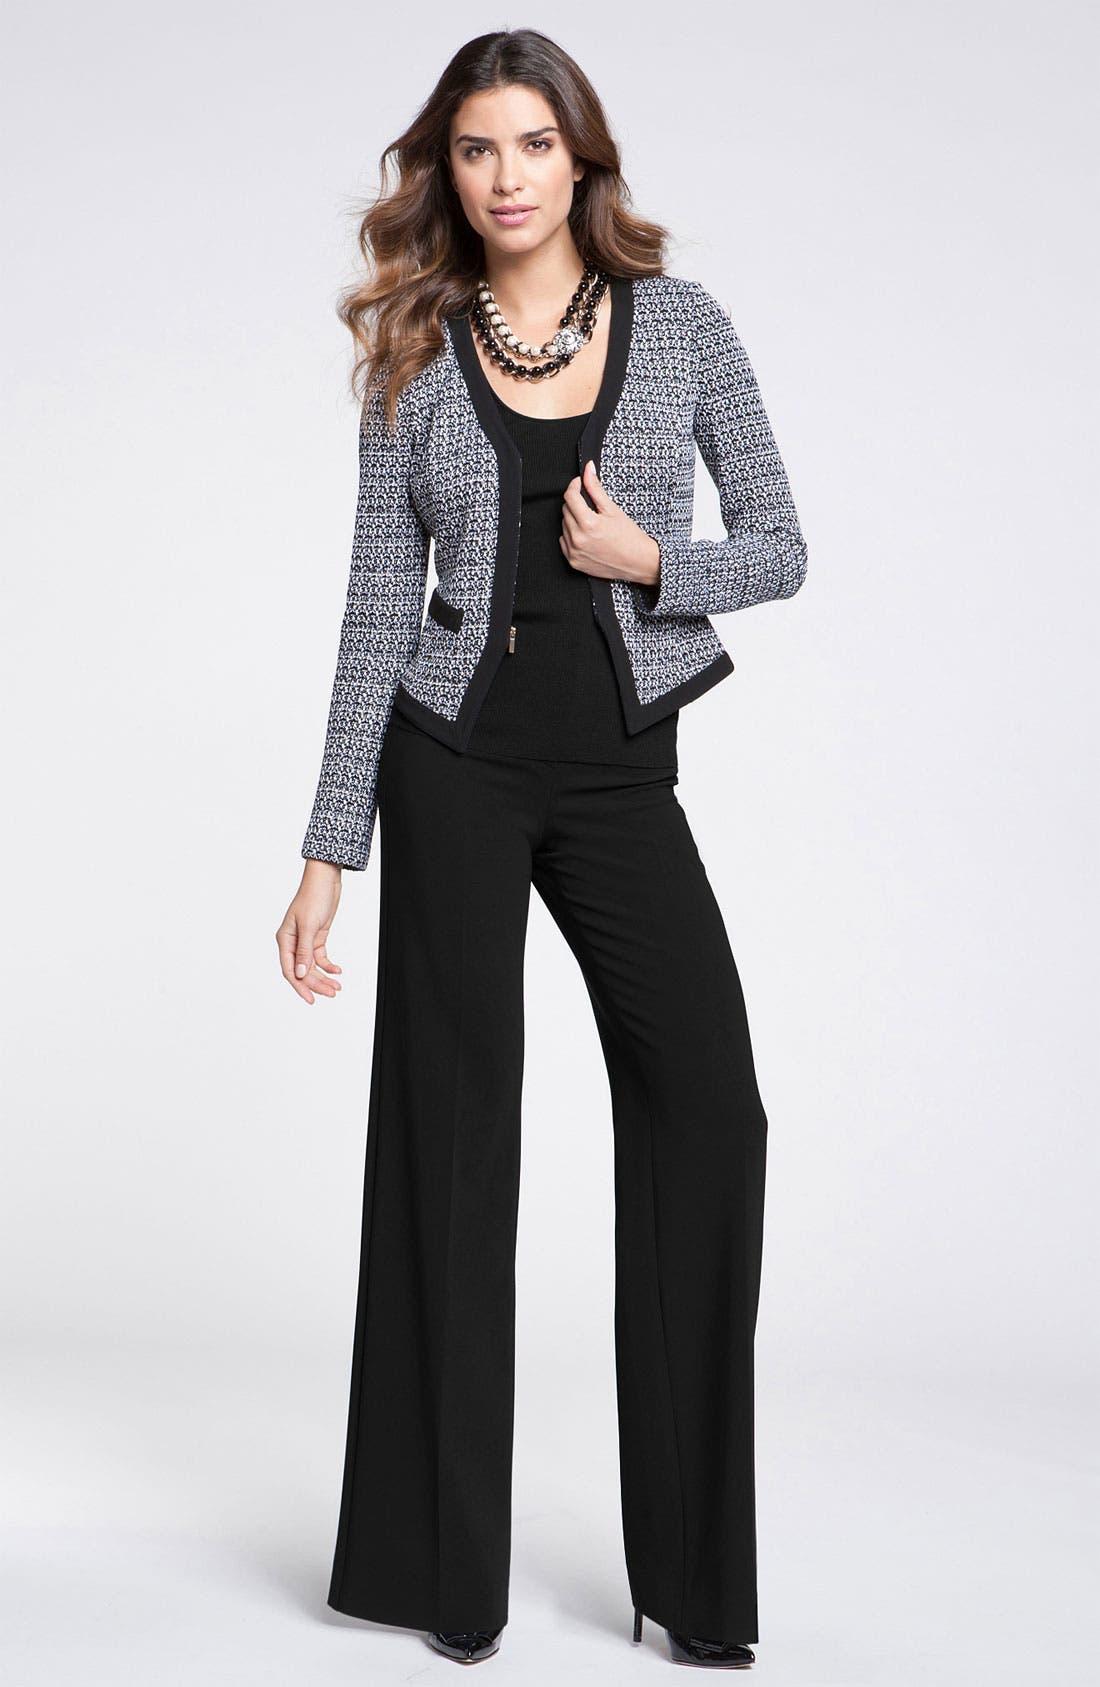 Alternate Image 1 Selected - St. John Collection 'Spencer' Tweed Knit Jacket